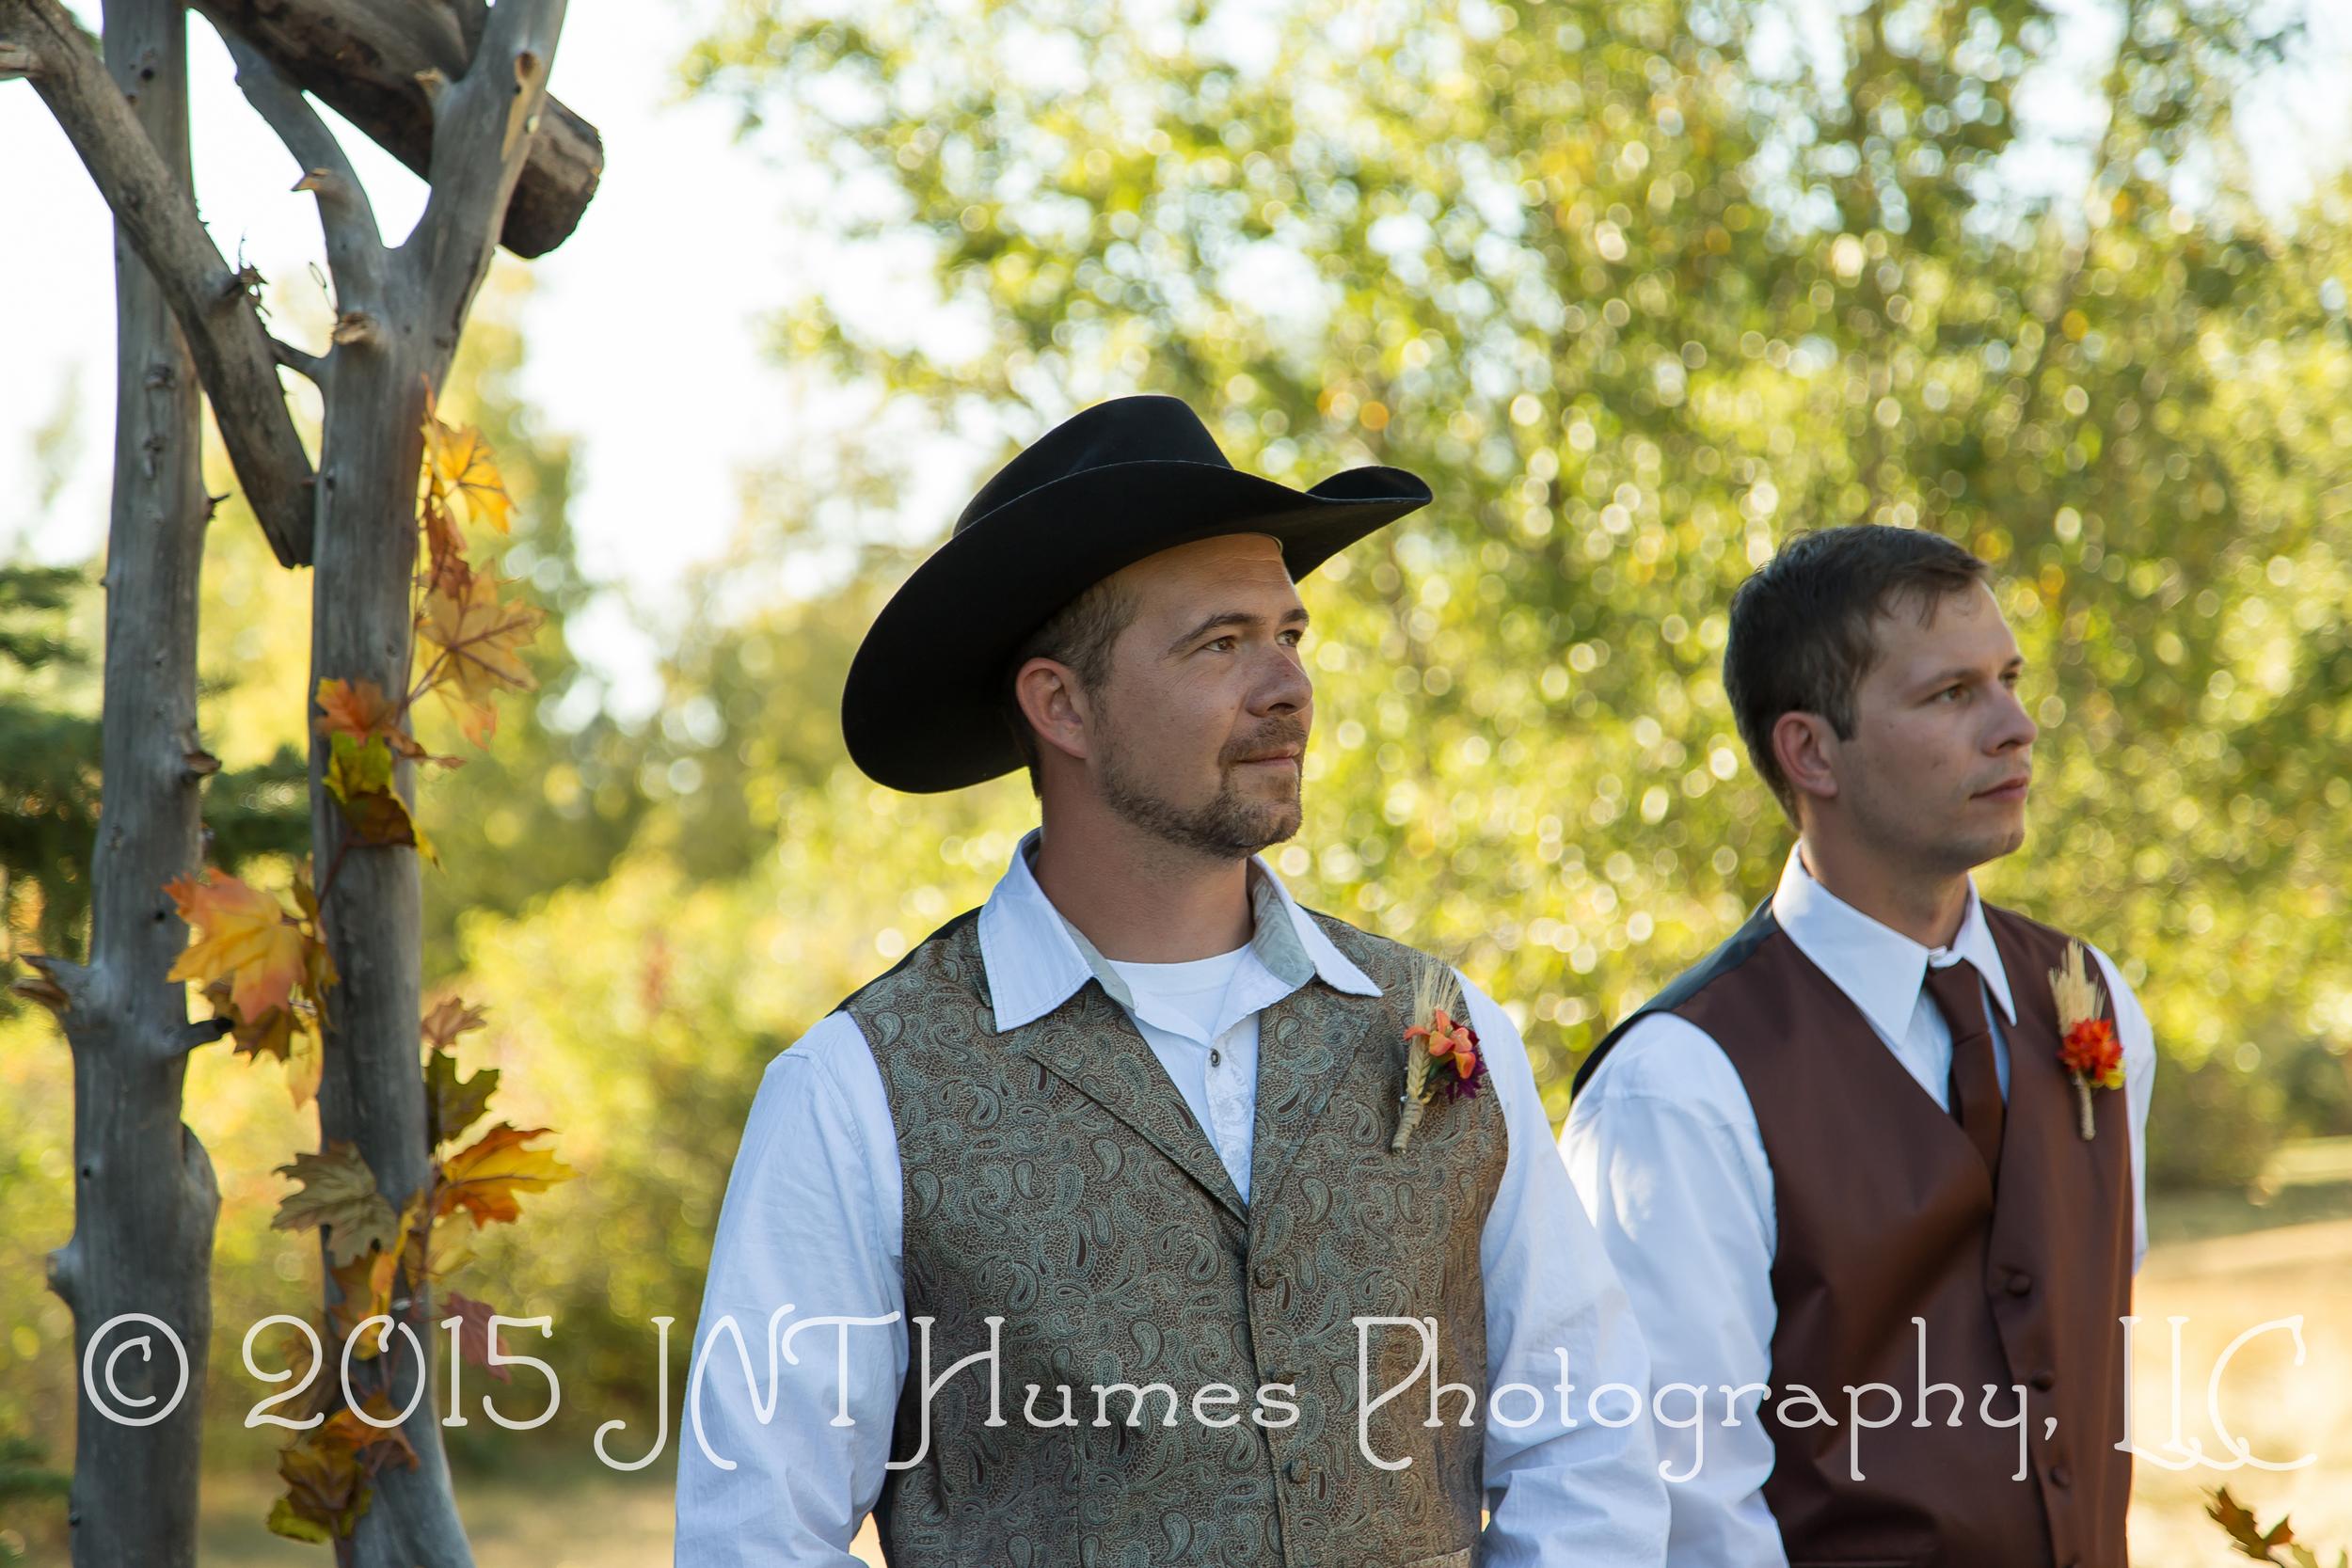 IMG_15512015-09-19© 2015 JNT Humes Photography, LLC.jpg